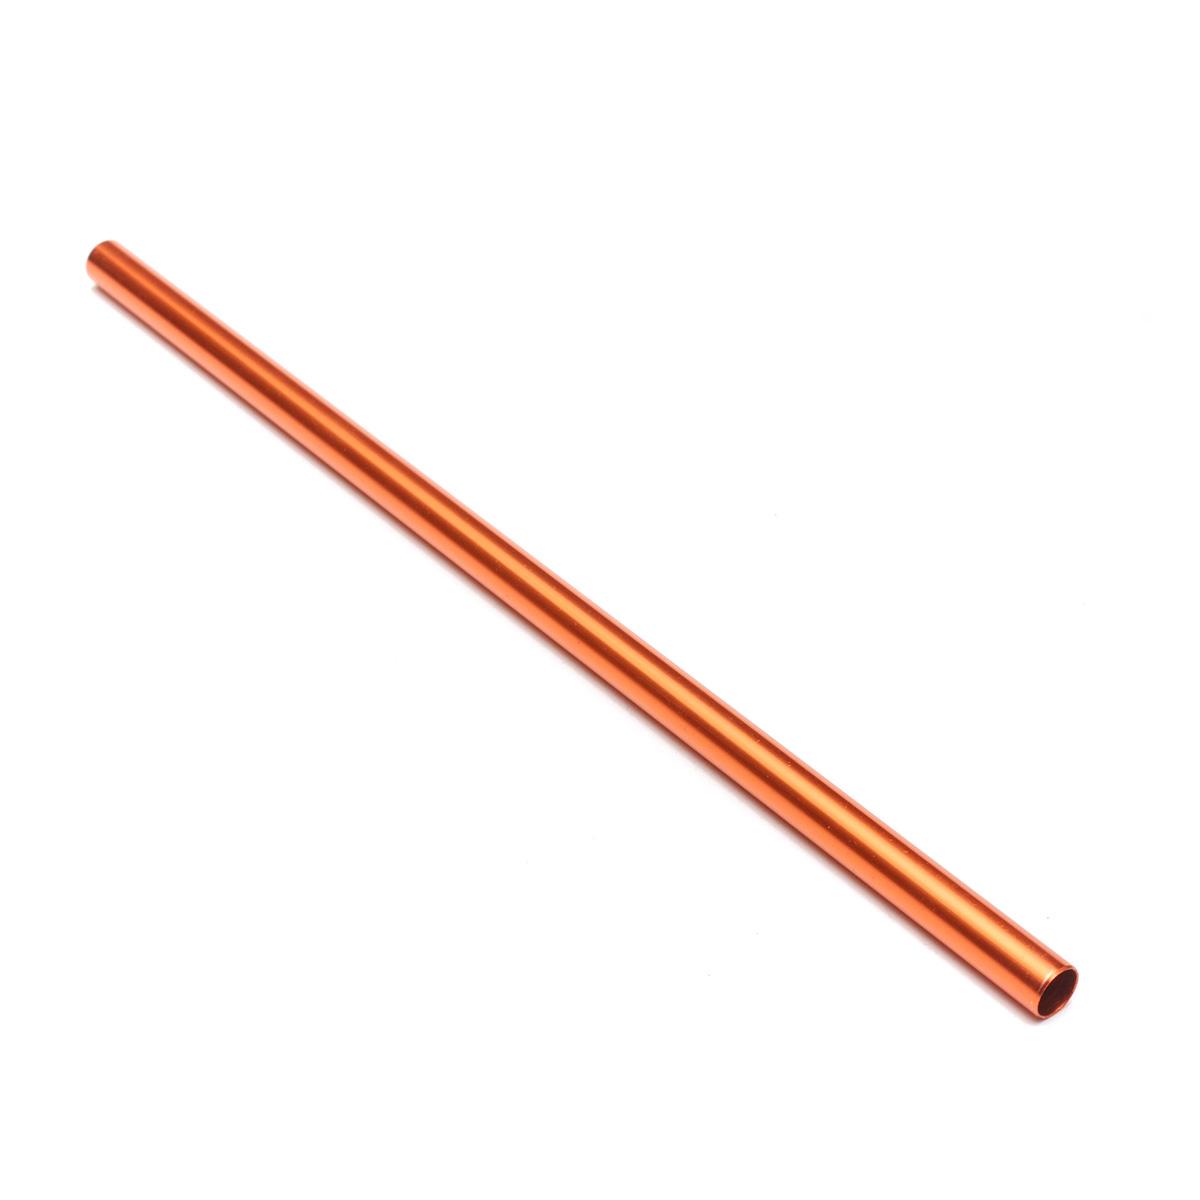 10Pcs/Set Aluminum Drinking Straw Straws Reusable Slurpee Cocktail Drinking Straw Party Supplies